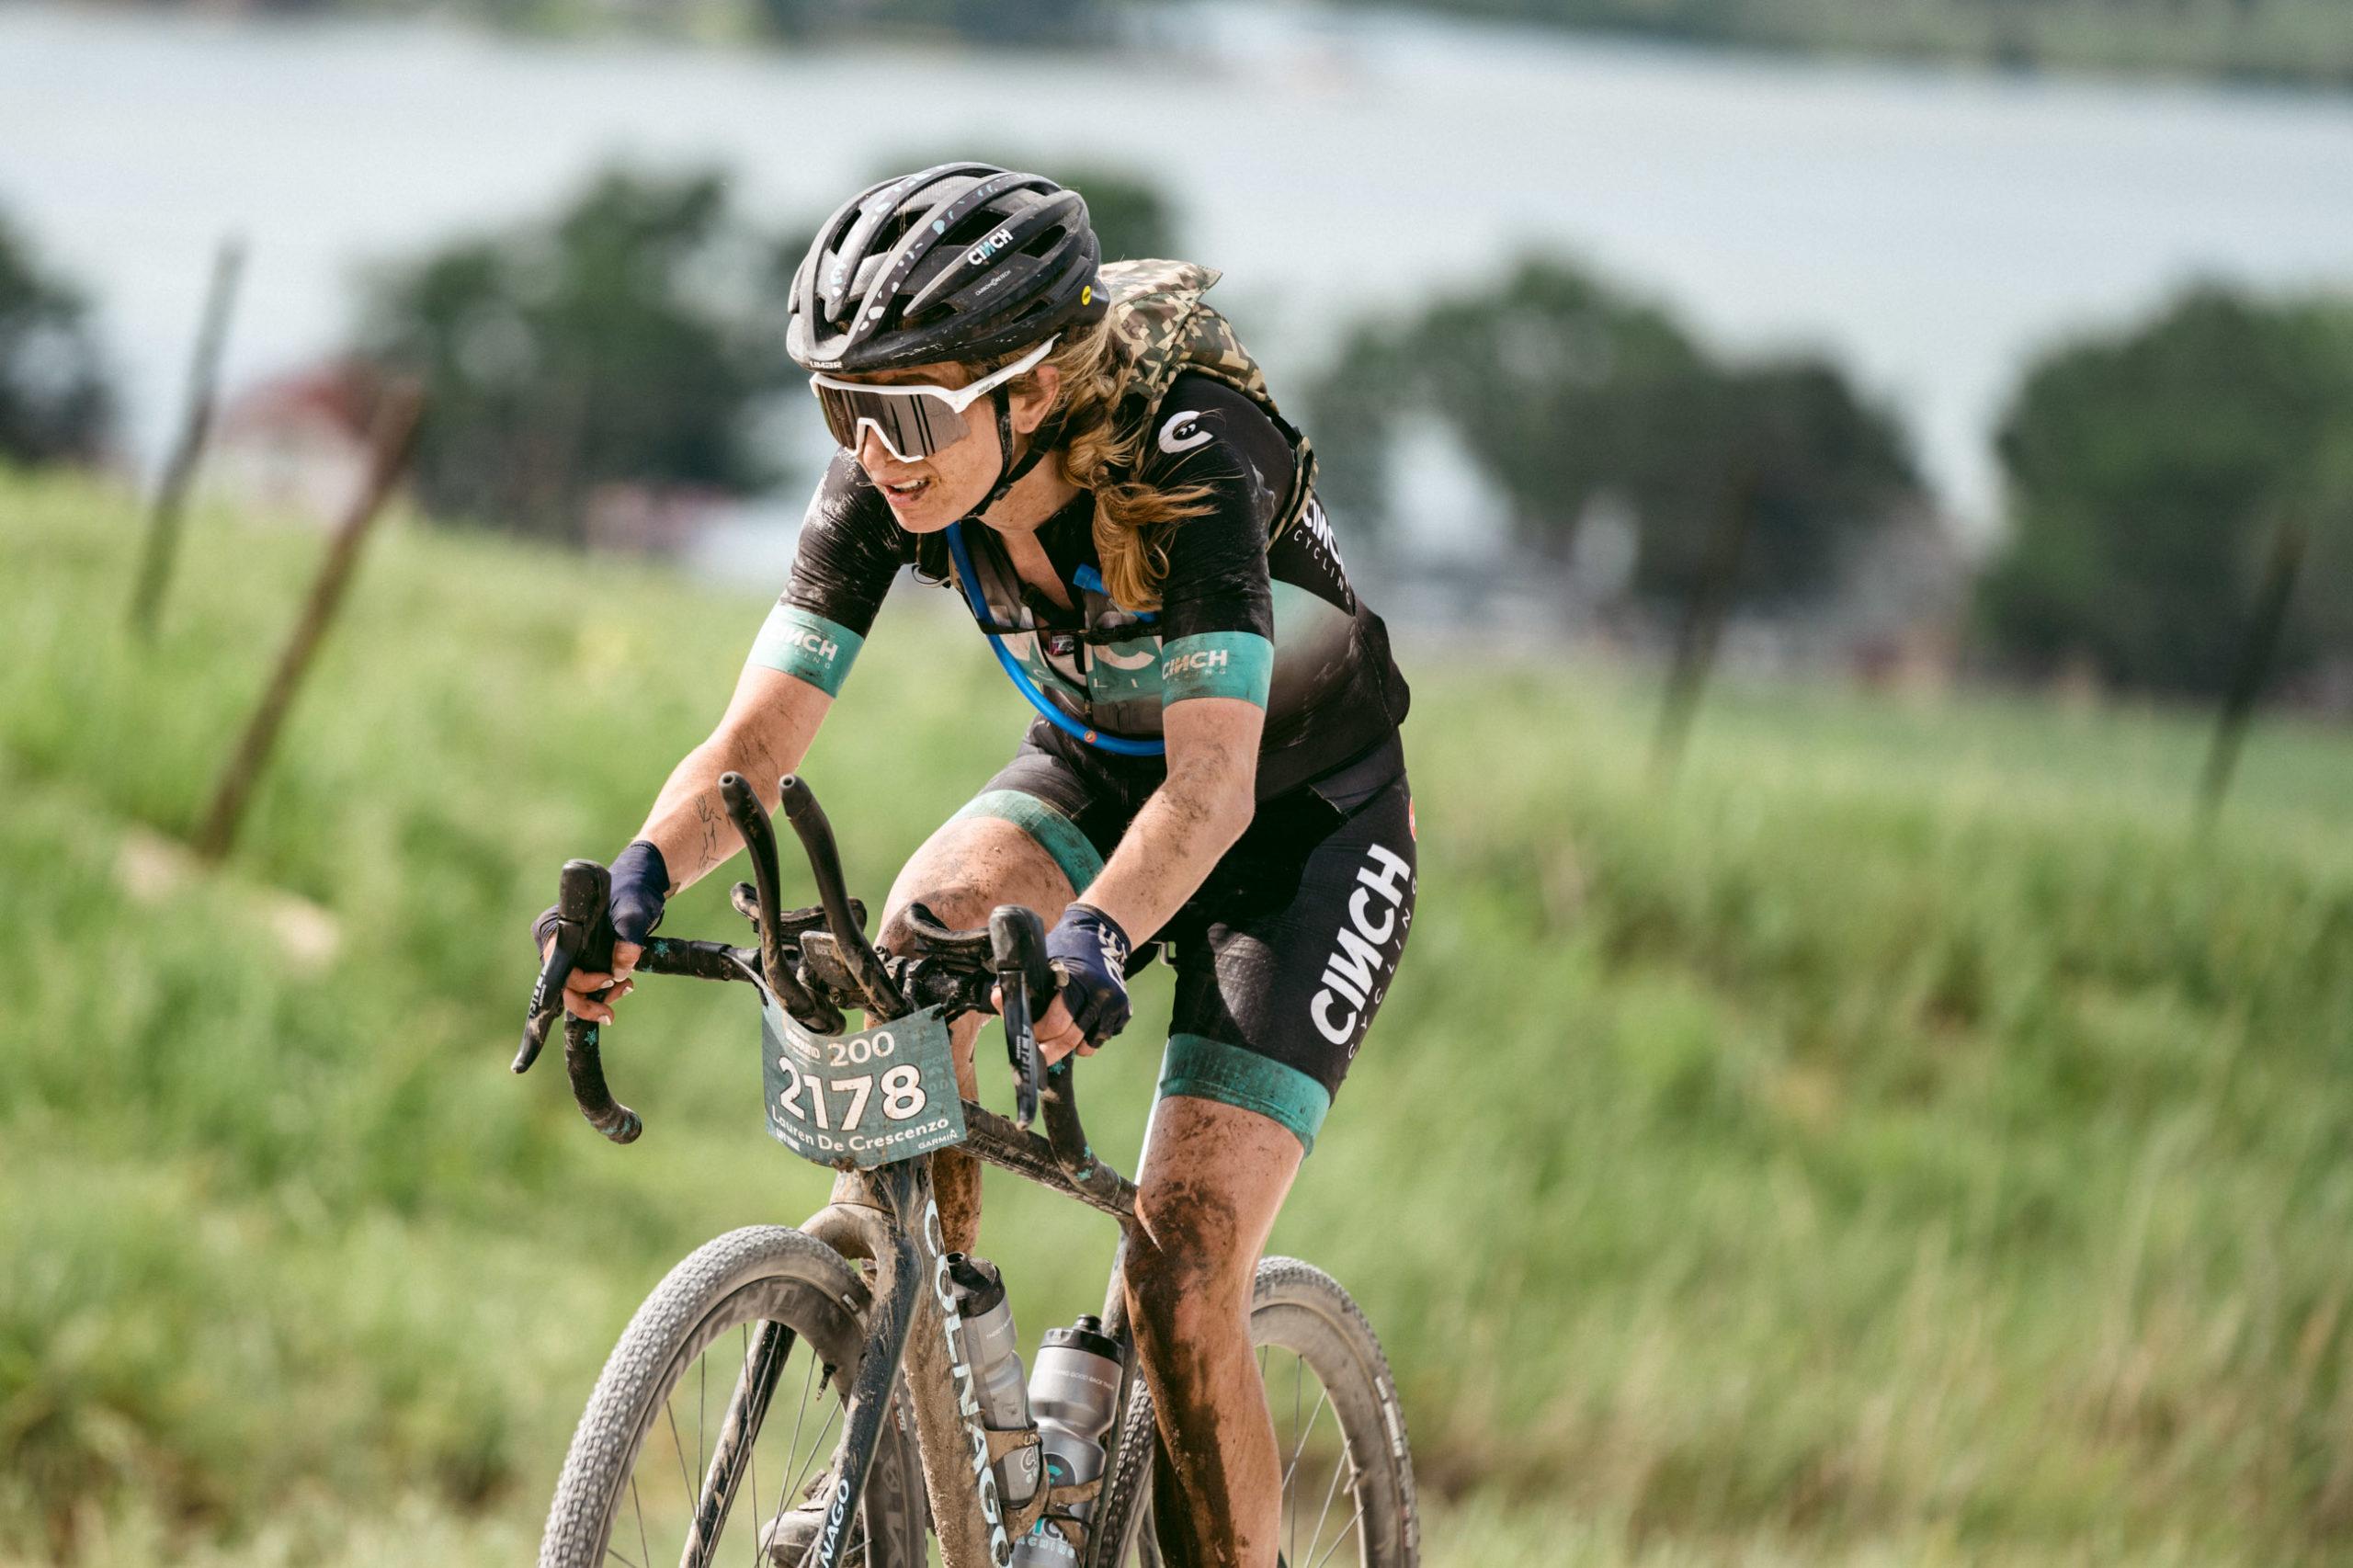 Women's UNBOUND 200 Winner, Lauren de Crescenzo. Photo courtesy ENVE Composites/Ian Matteson